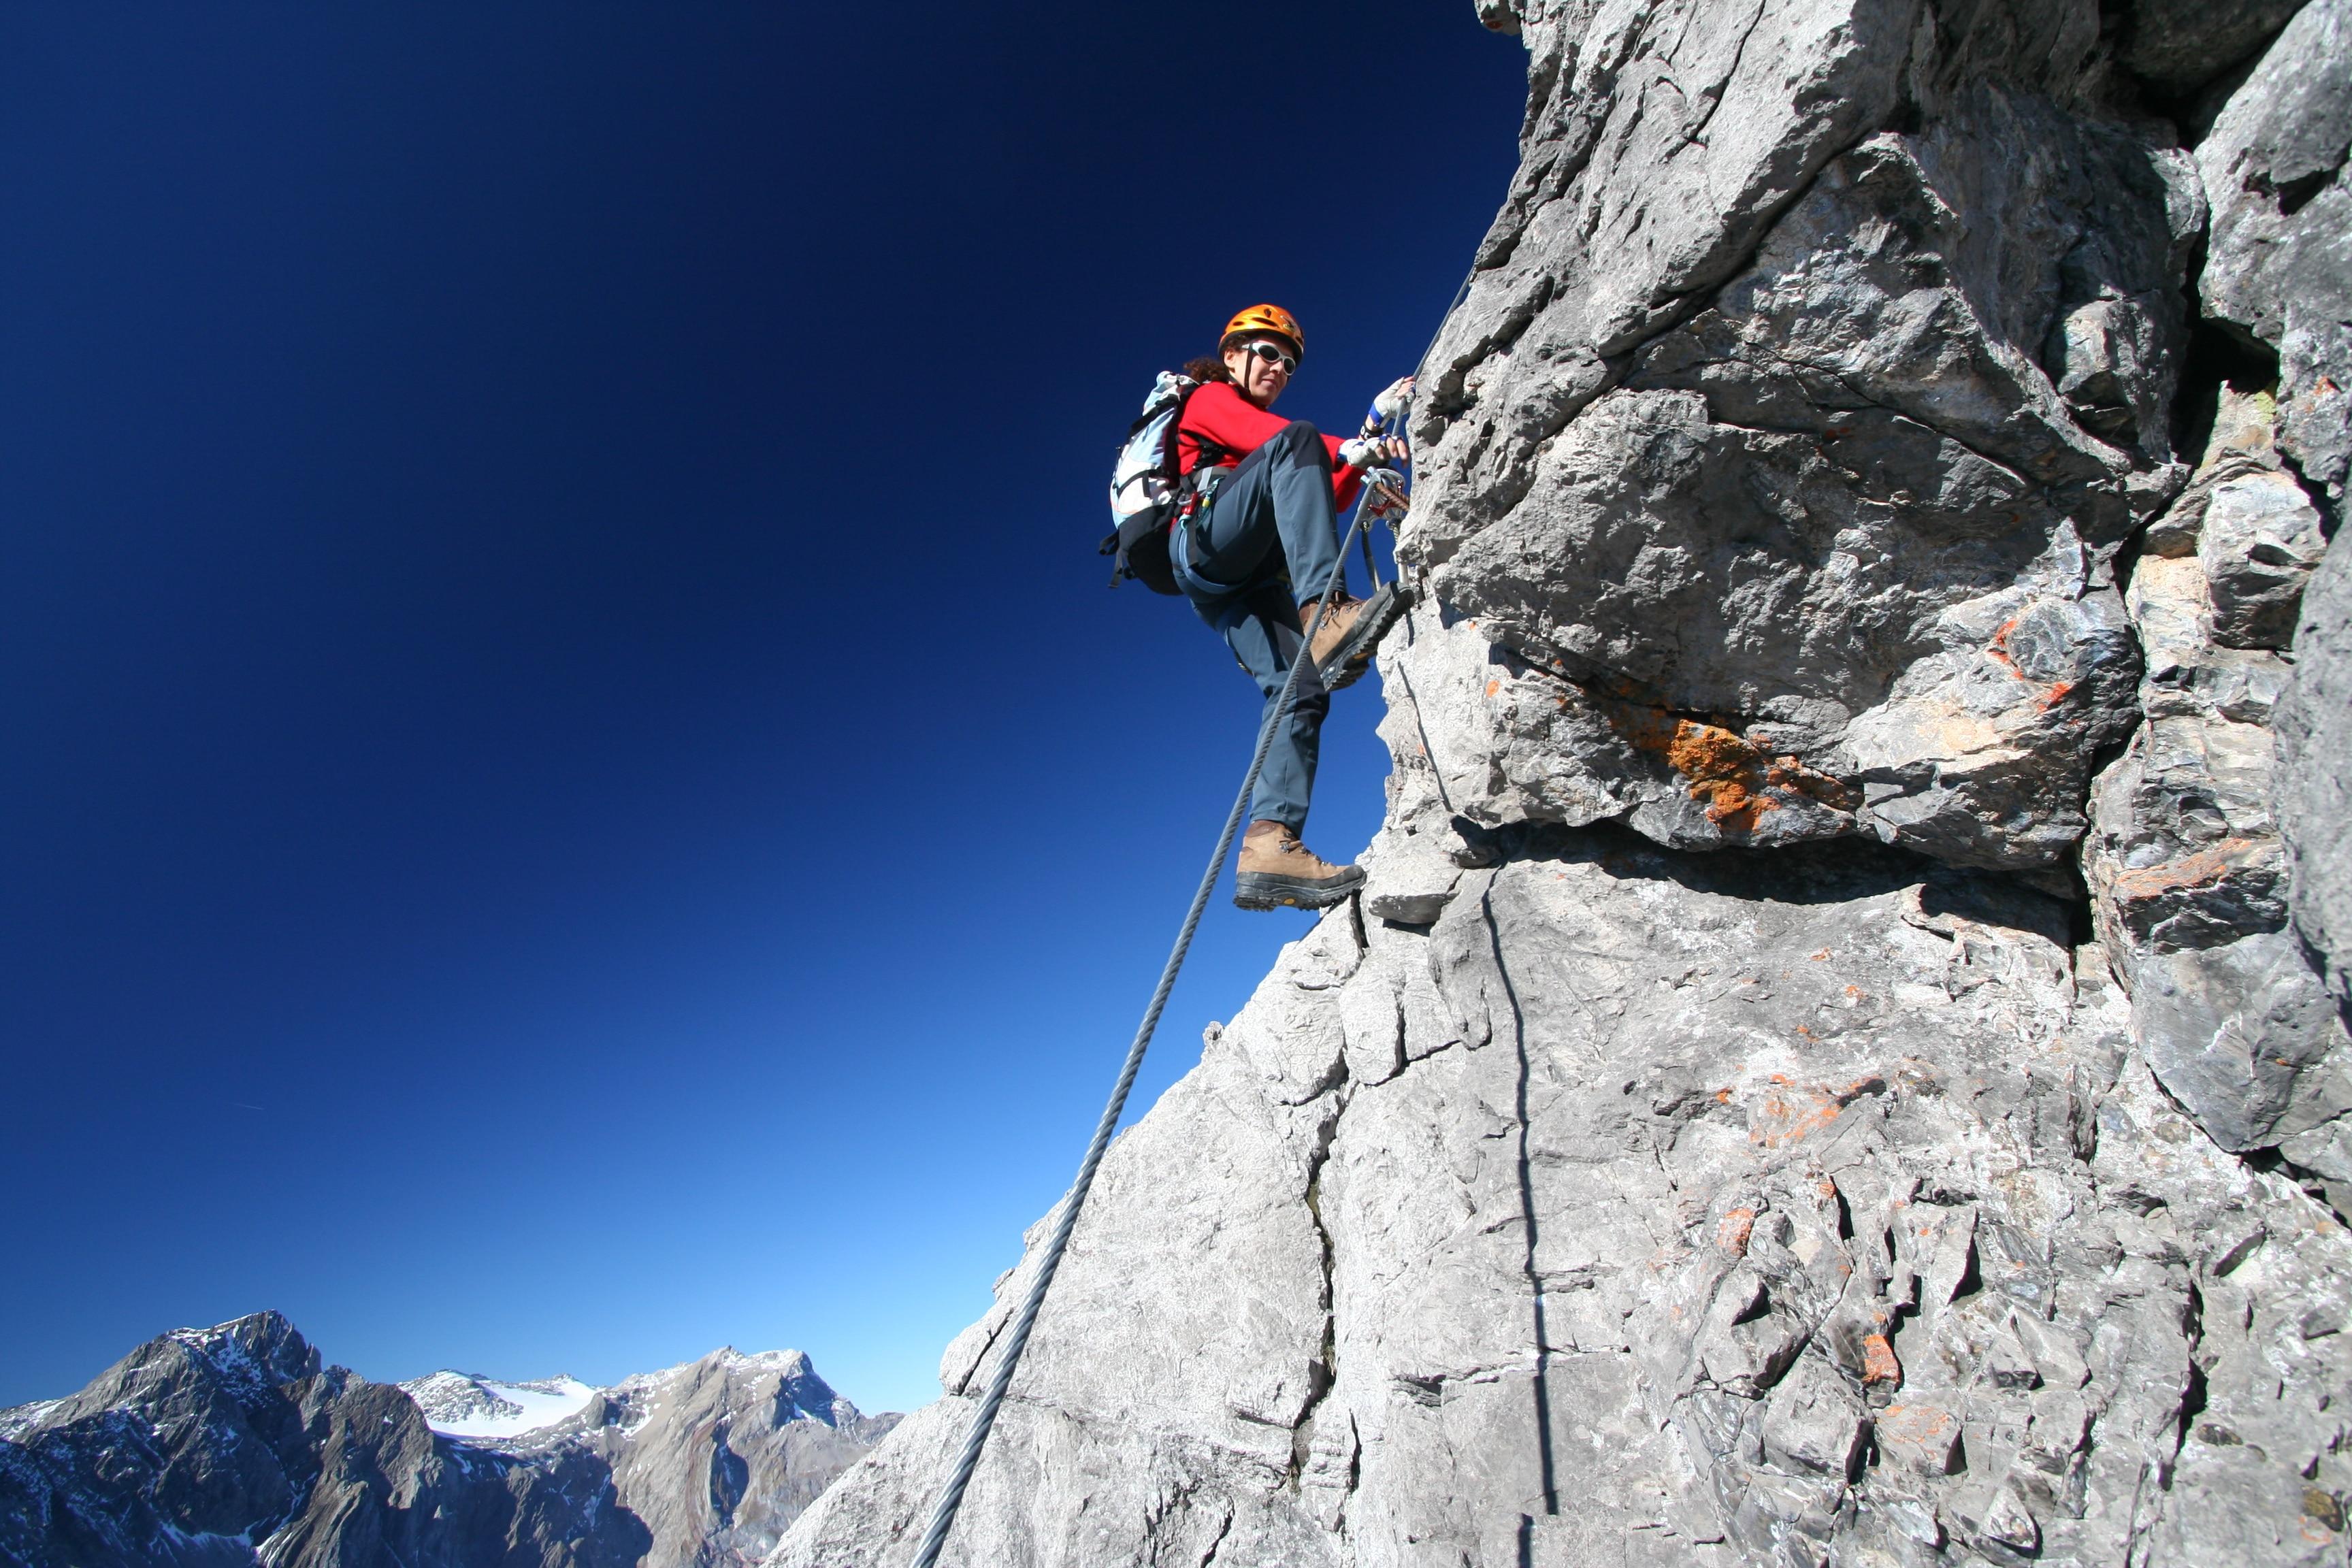 Klettersteig Bavaria : Klettersteige saula klettersteig km bergwelten